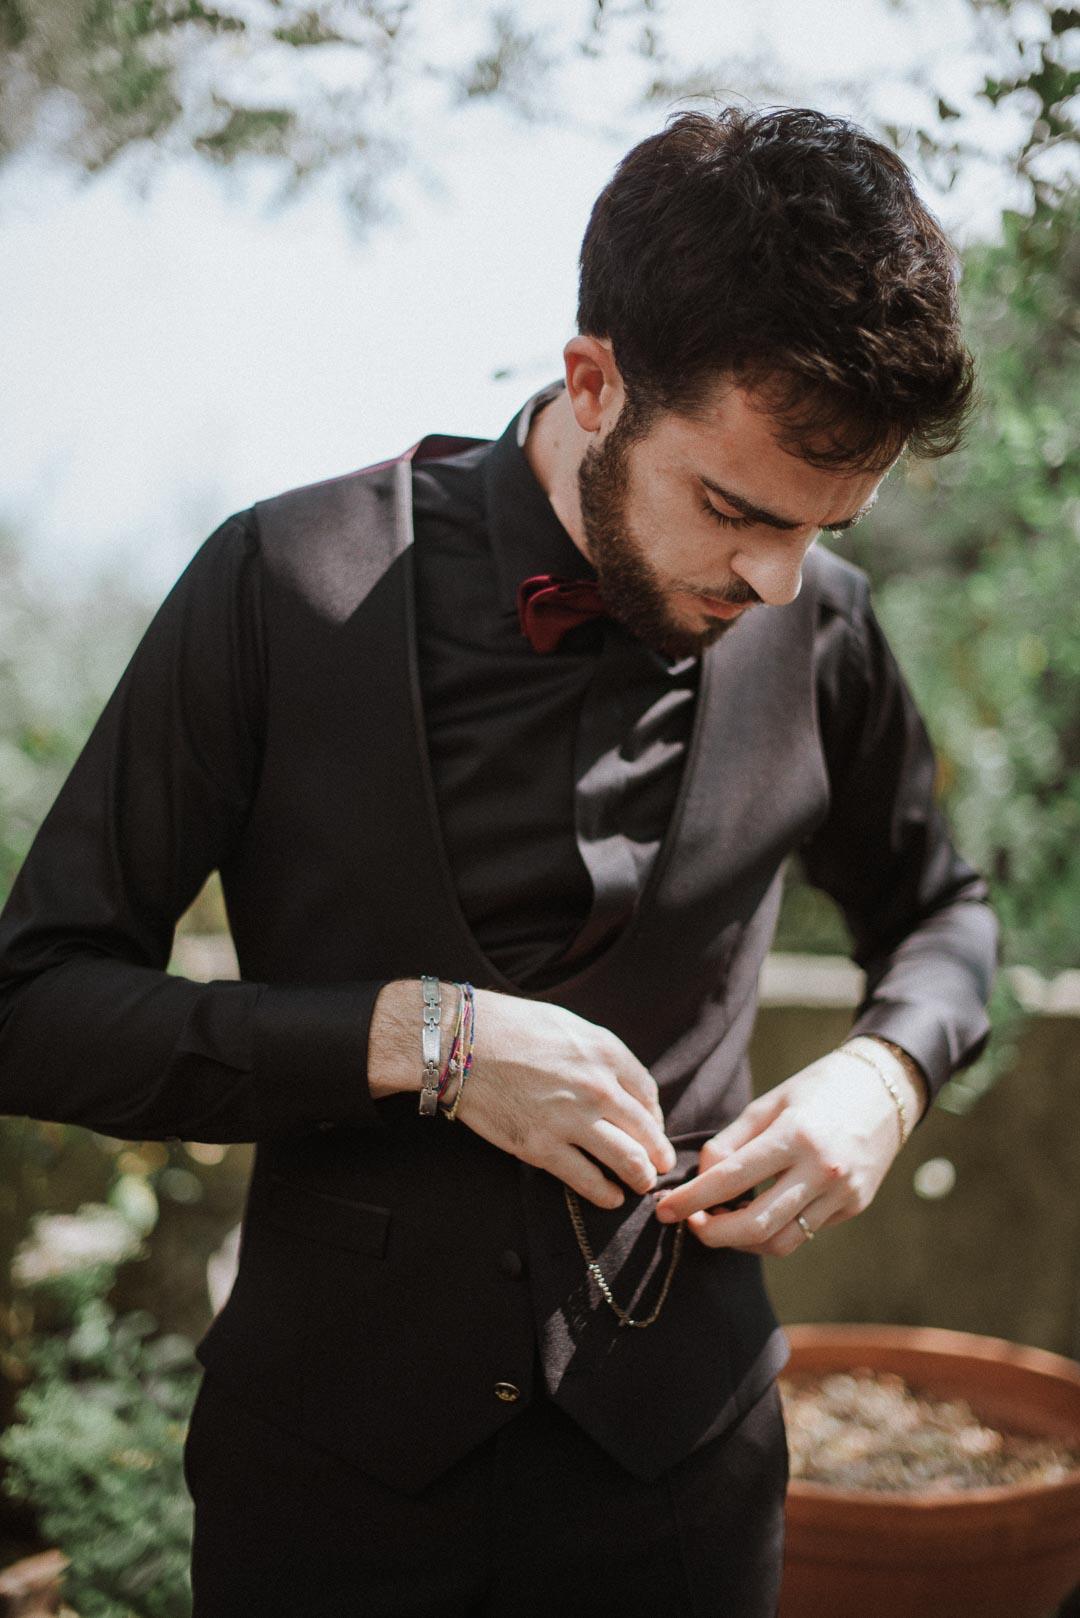 wedding-photographer-destination-fineart-bespoke-reportage-tuscany-villascorzi-vivianeizzo-spazio46-9